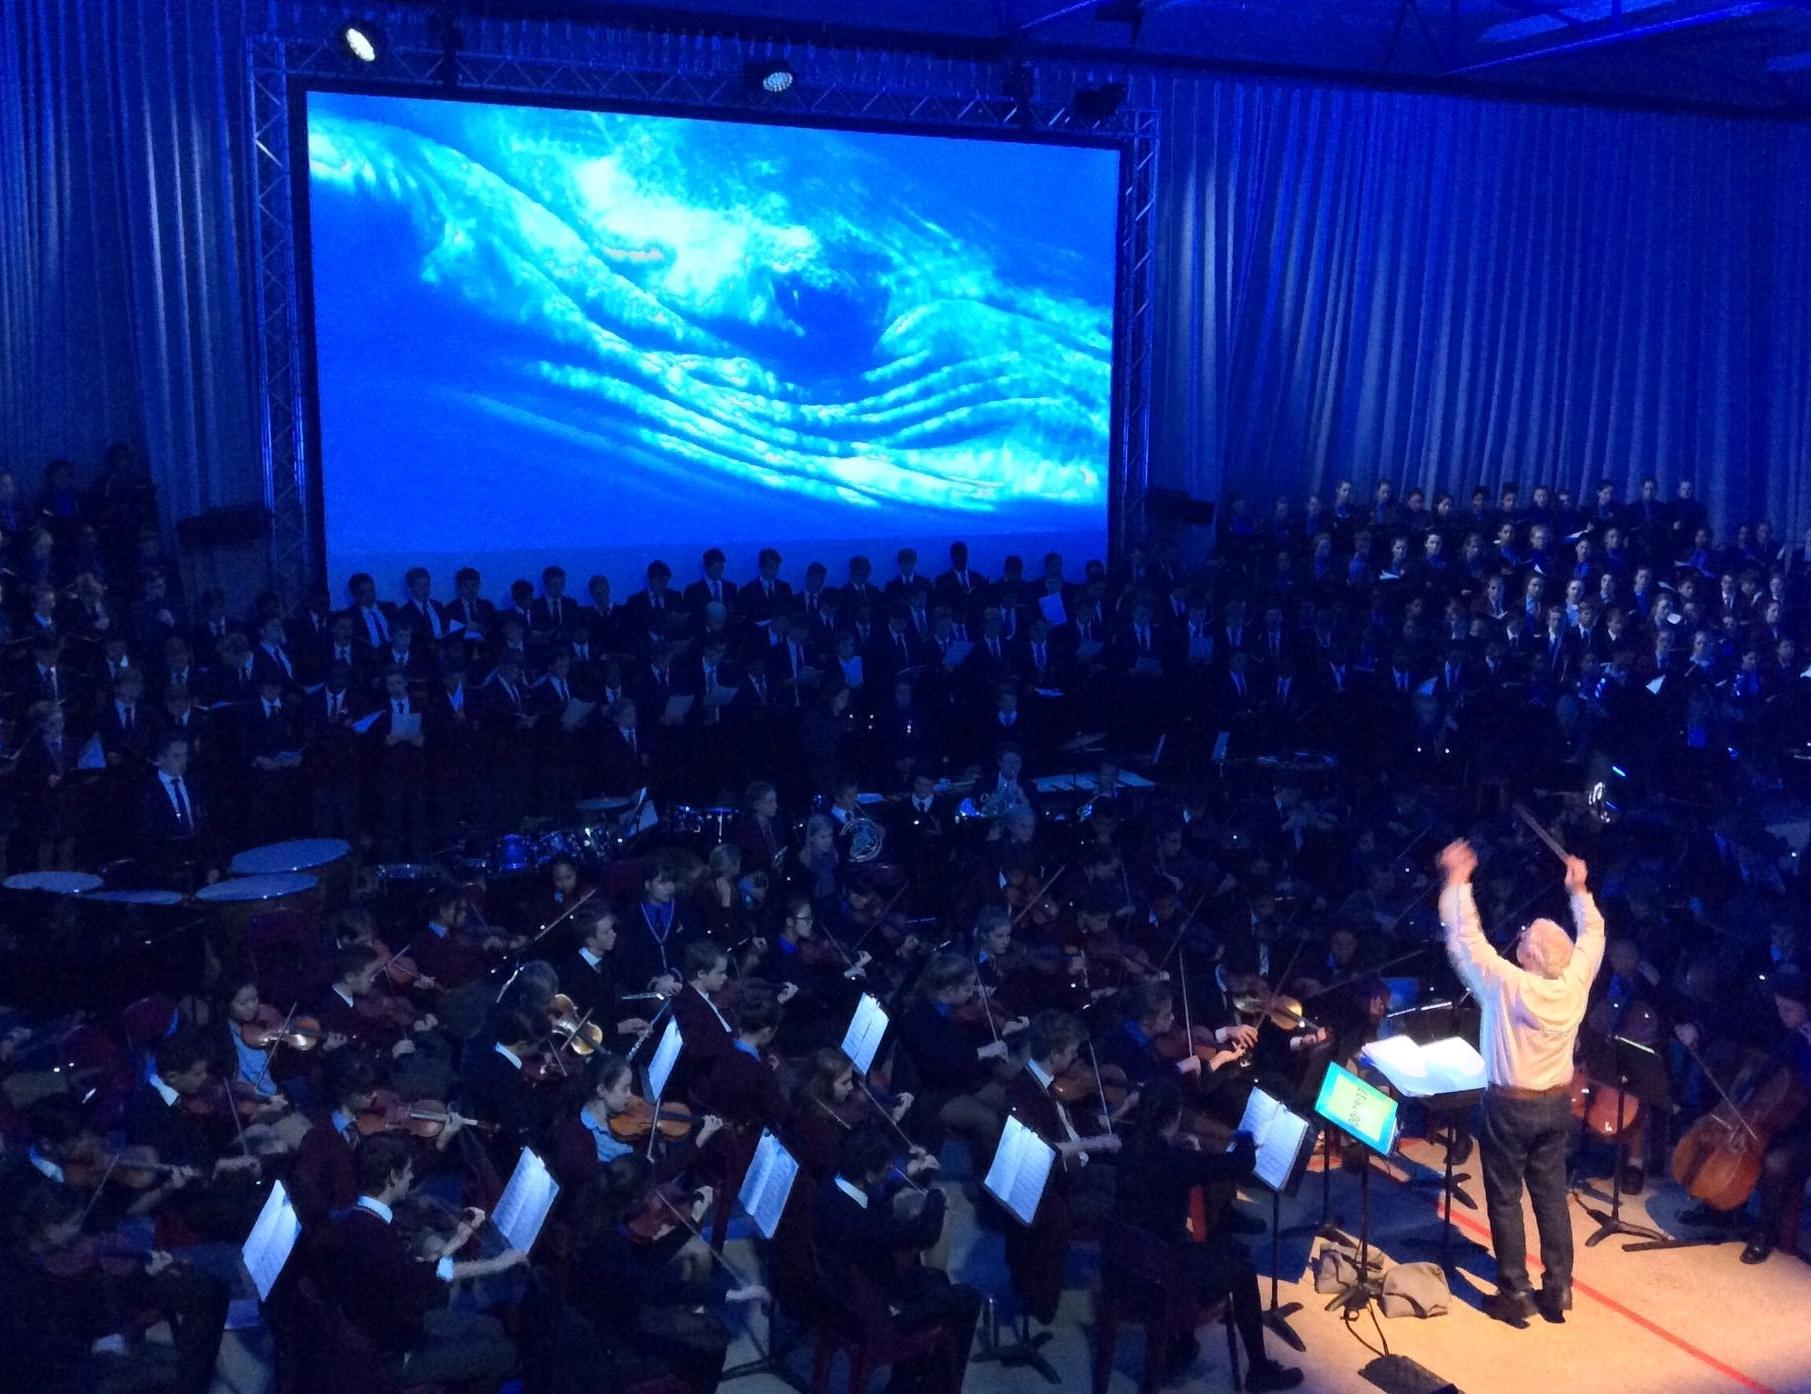 Ocean performance